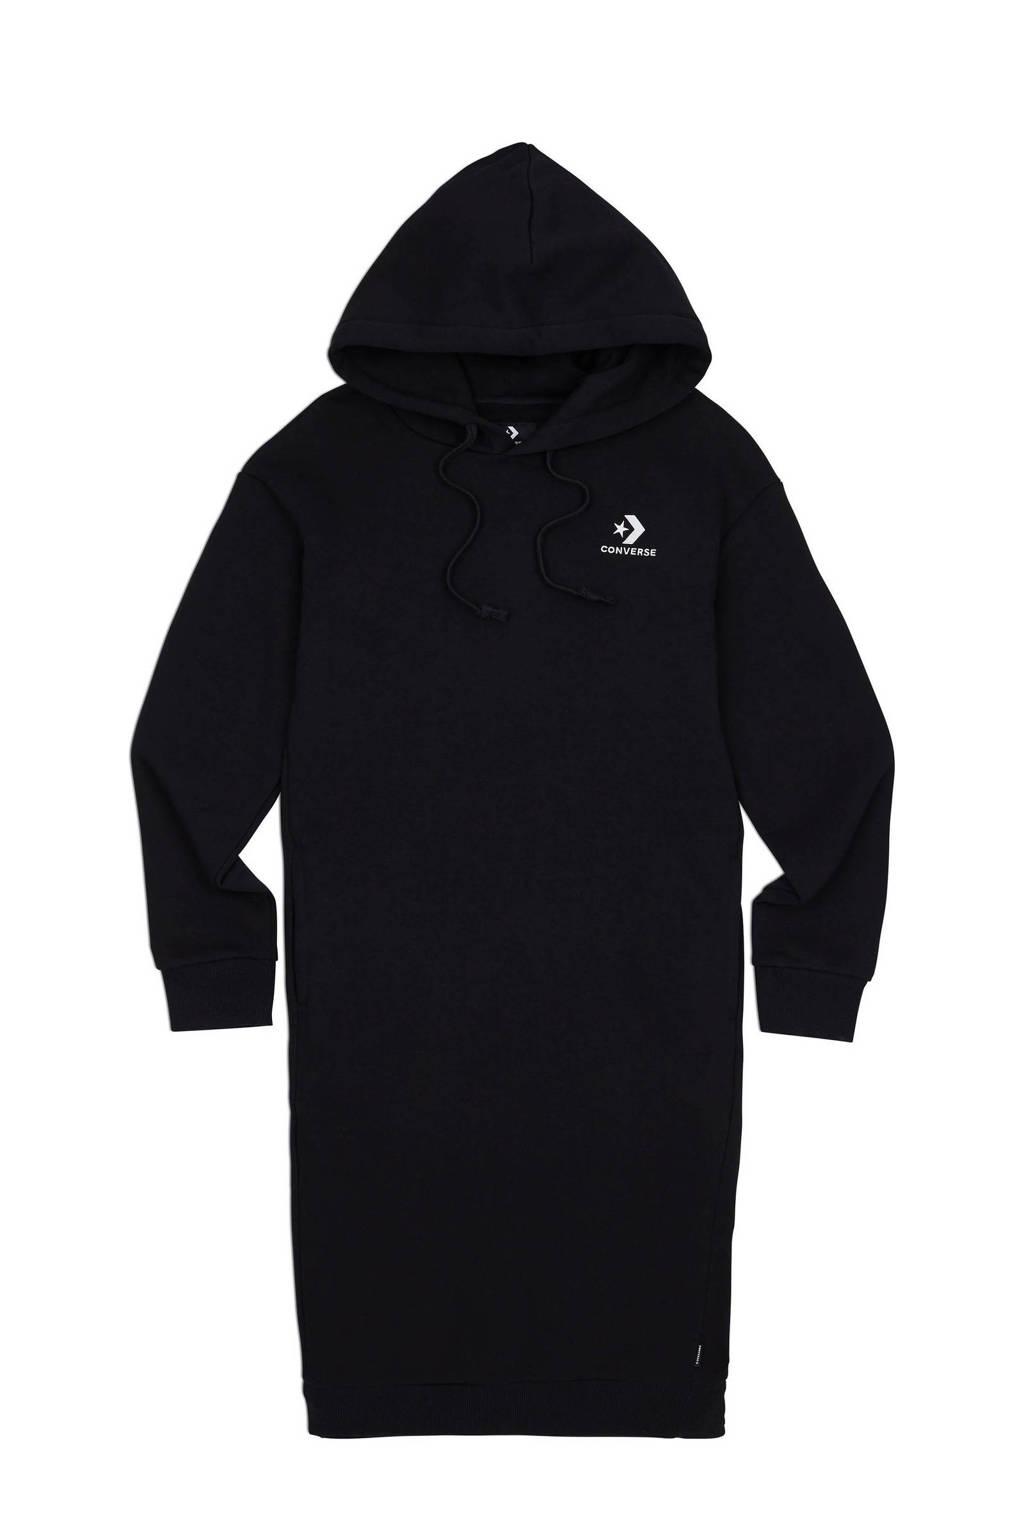 Converse sweatjurk met logo zwart, Zwart